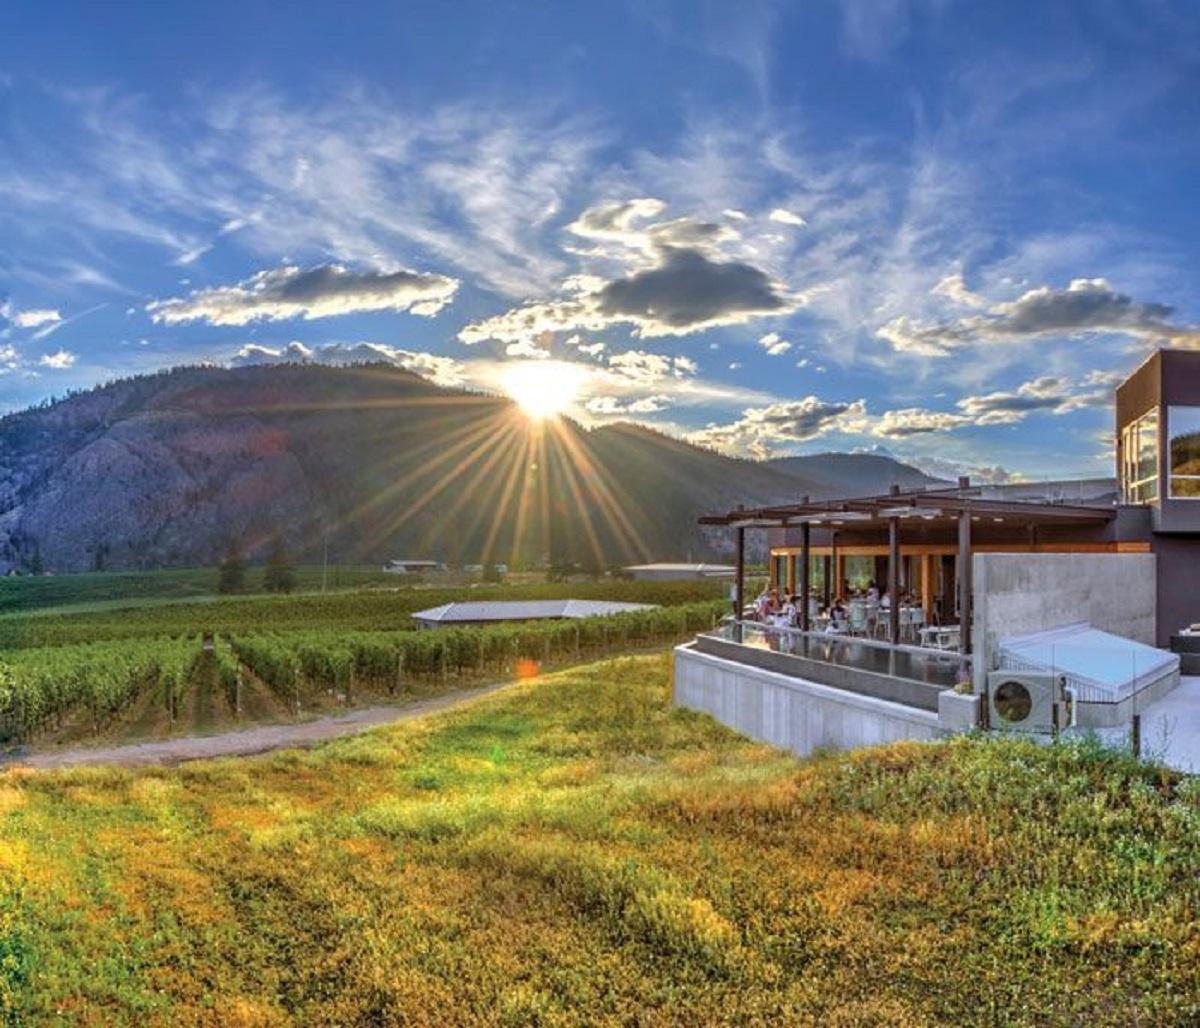 The-Okanagan_s-8-Most-Stunning-Wineries